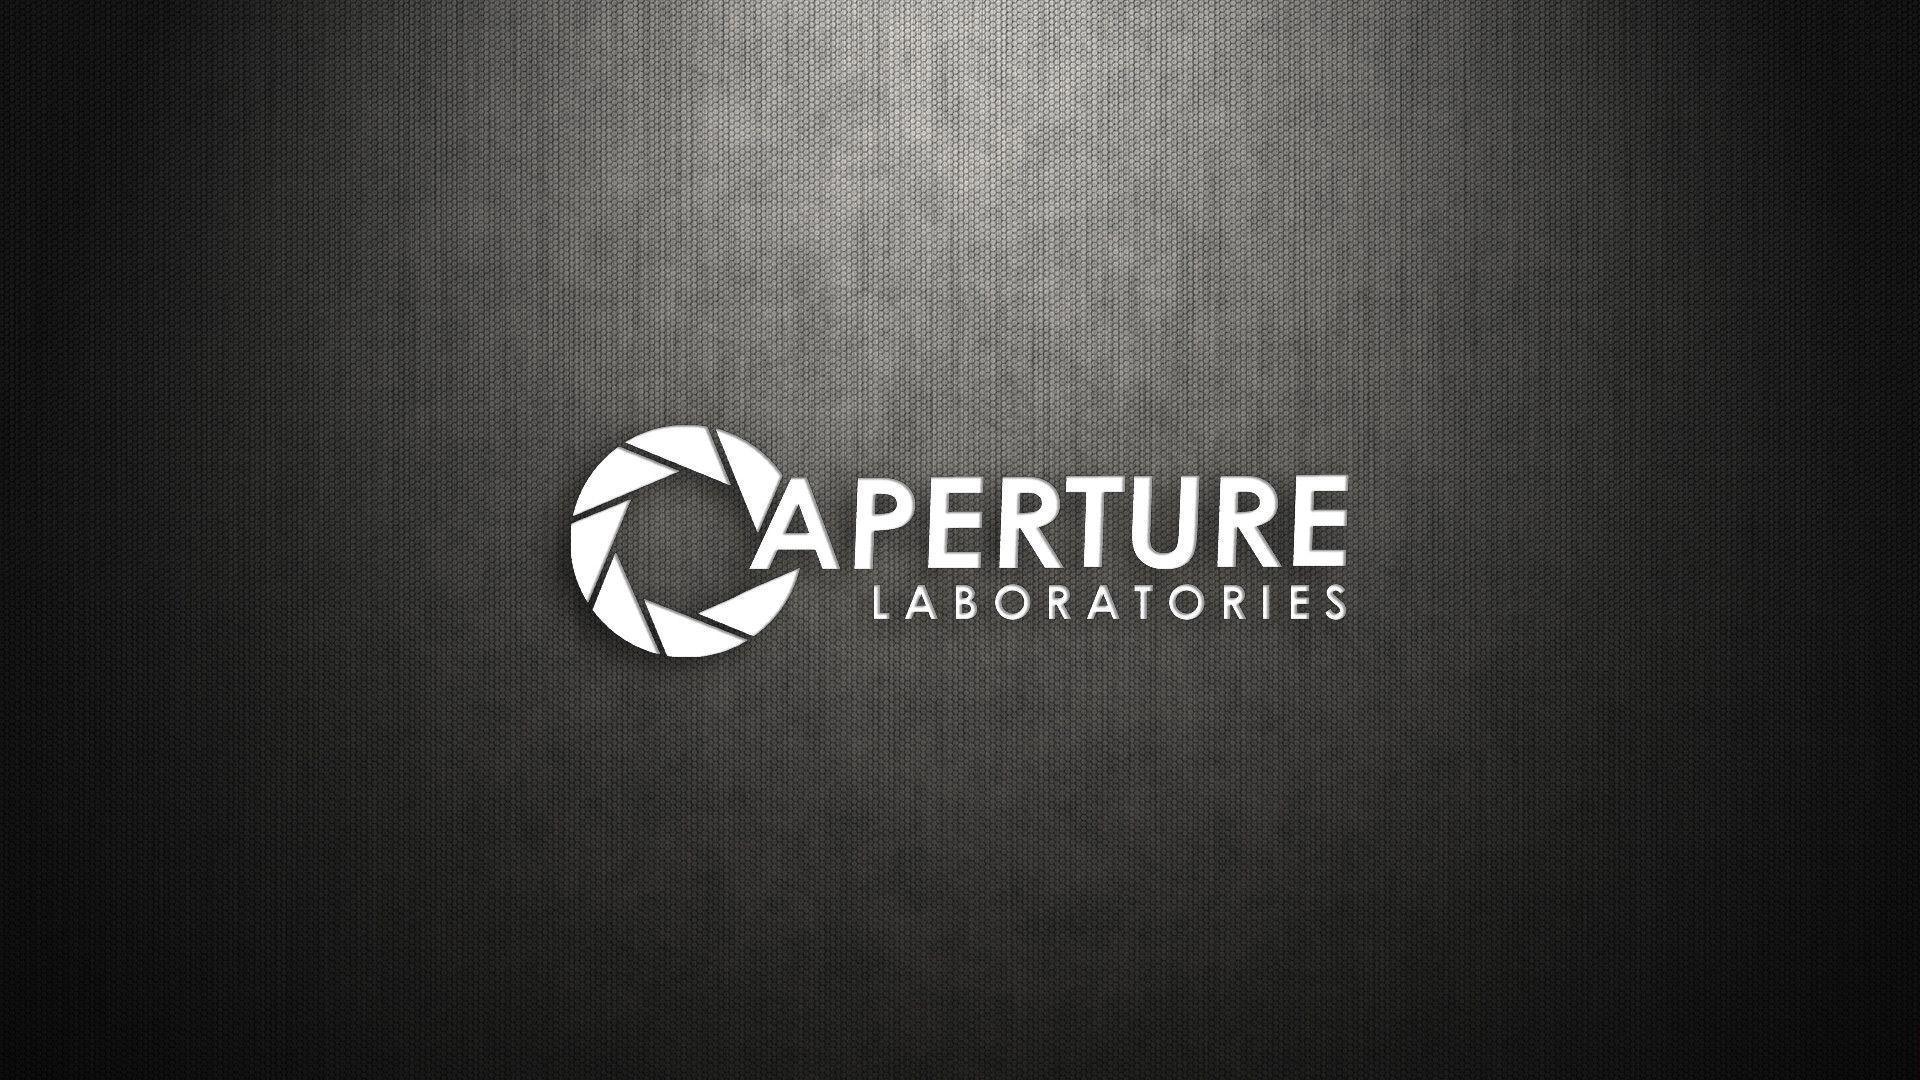 aperture wallpaper - photo #3